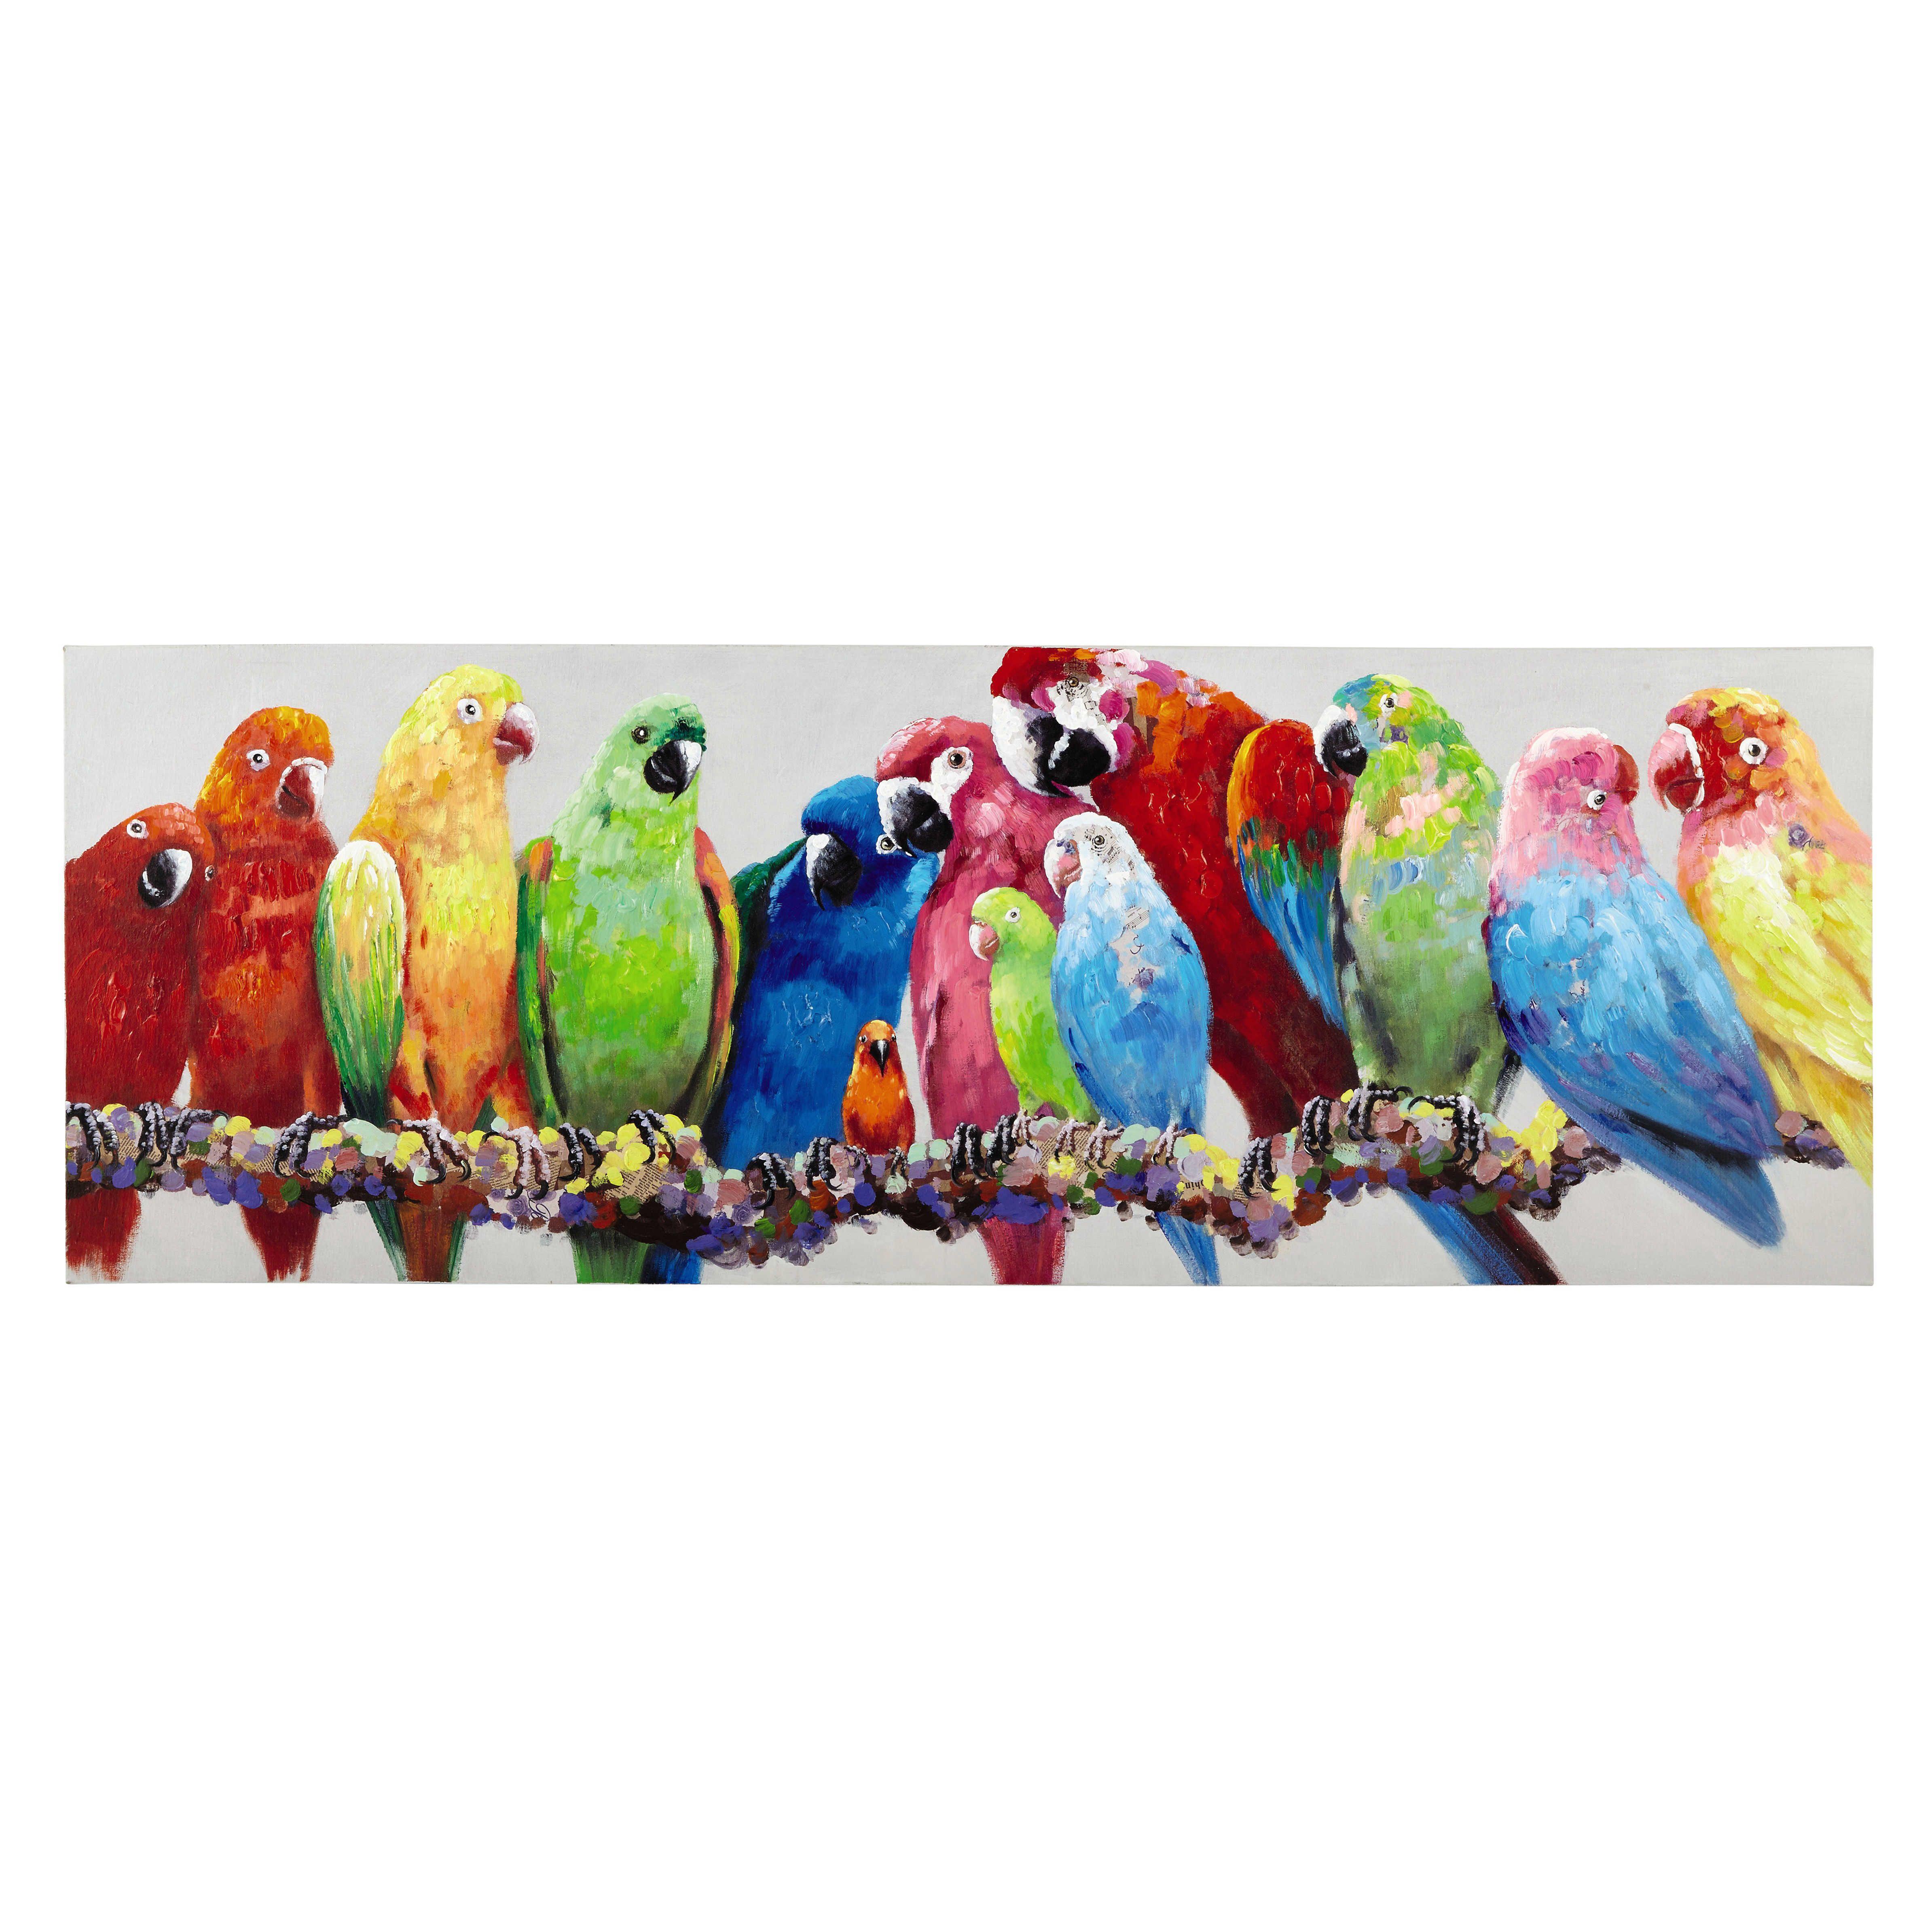 toile perroquets multicolores 70 x 200 cm perroquets toiles et peinture. Black Bedroom Furniture Sets. Home Design Ideas